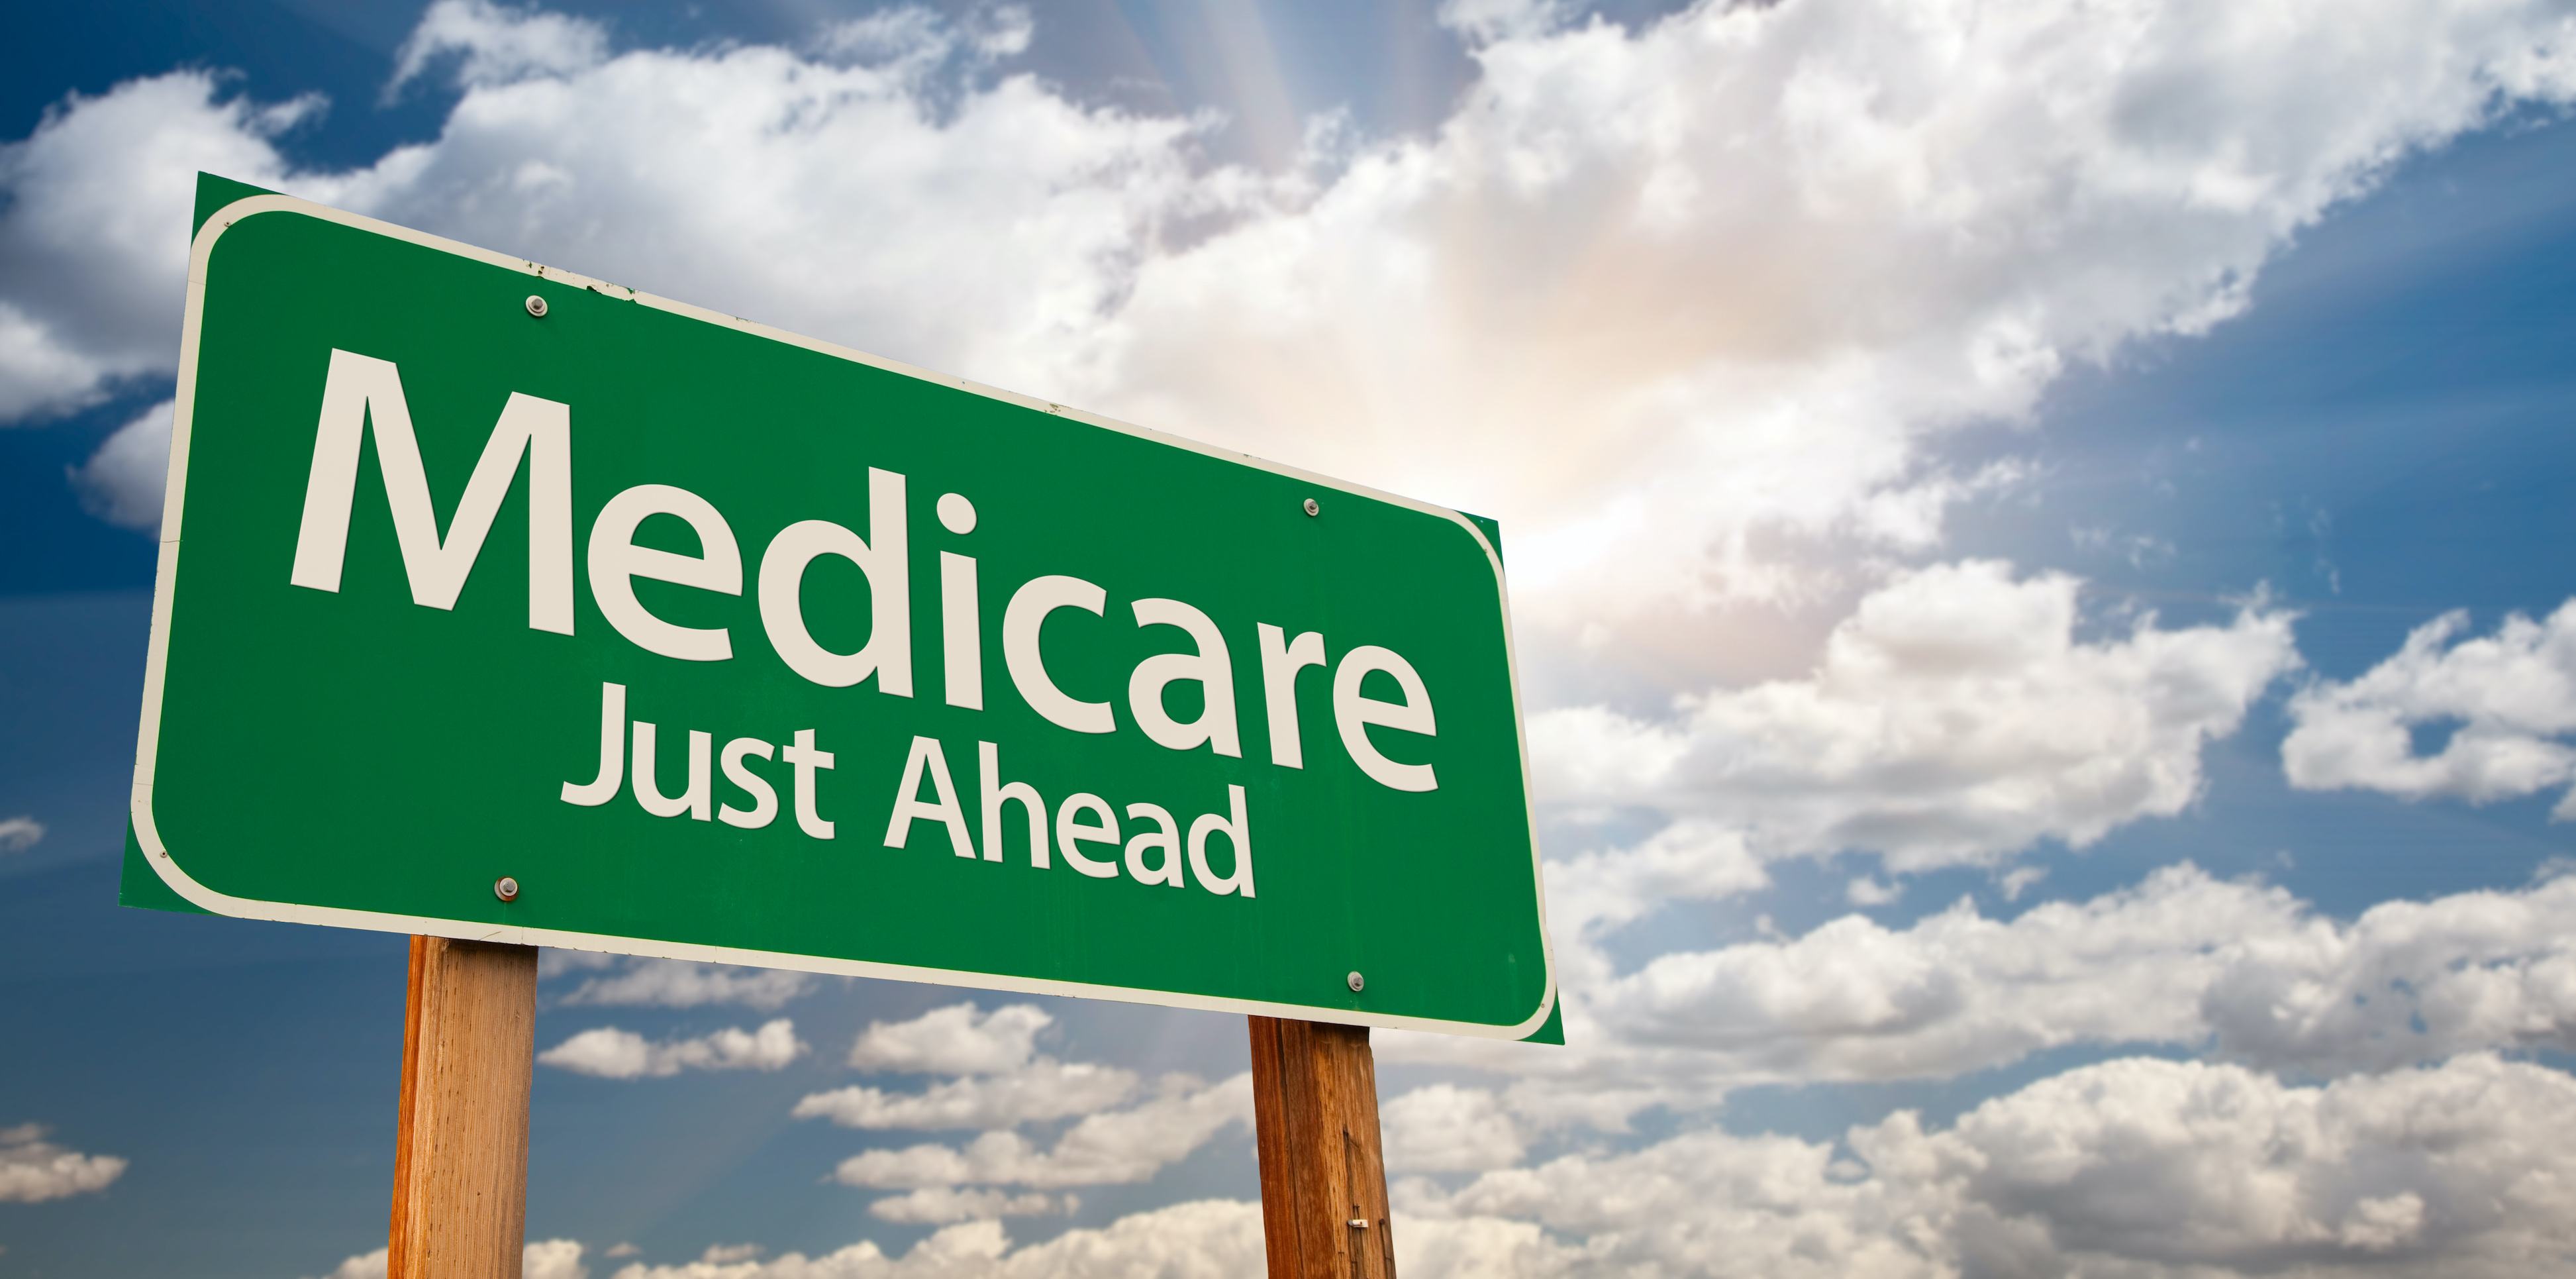 Get Medicare early through SSDI